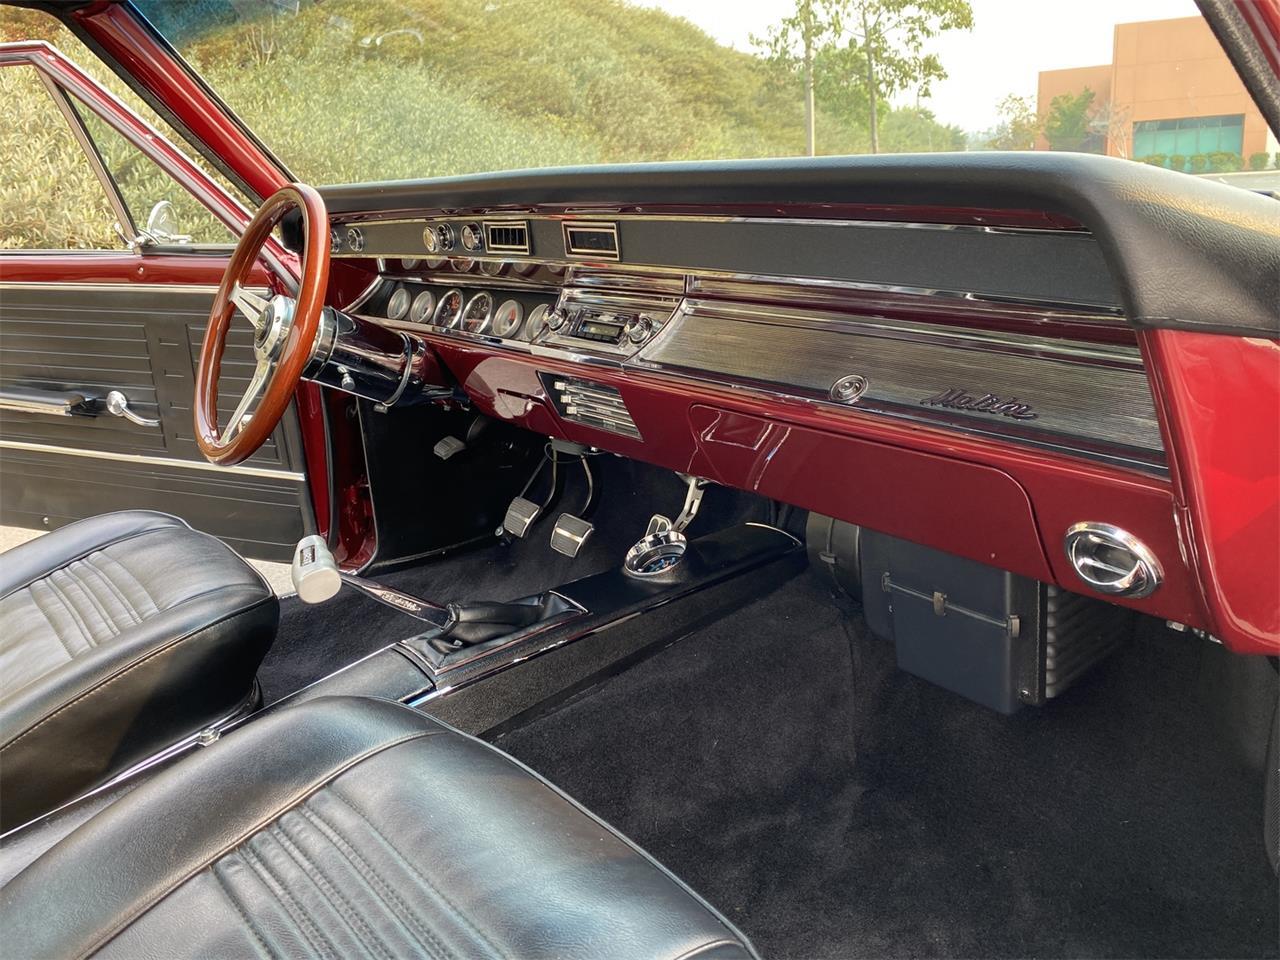 1967 Chevrolet El Camino (CC-1412723) for sale in Fairfield, California